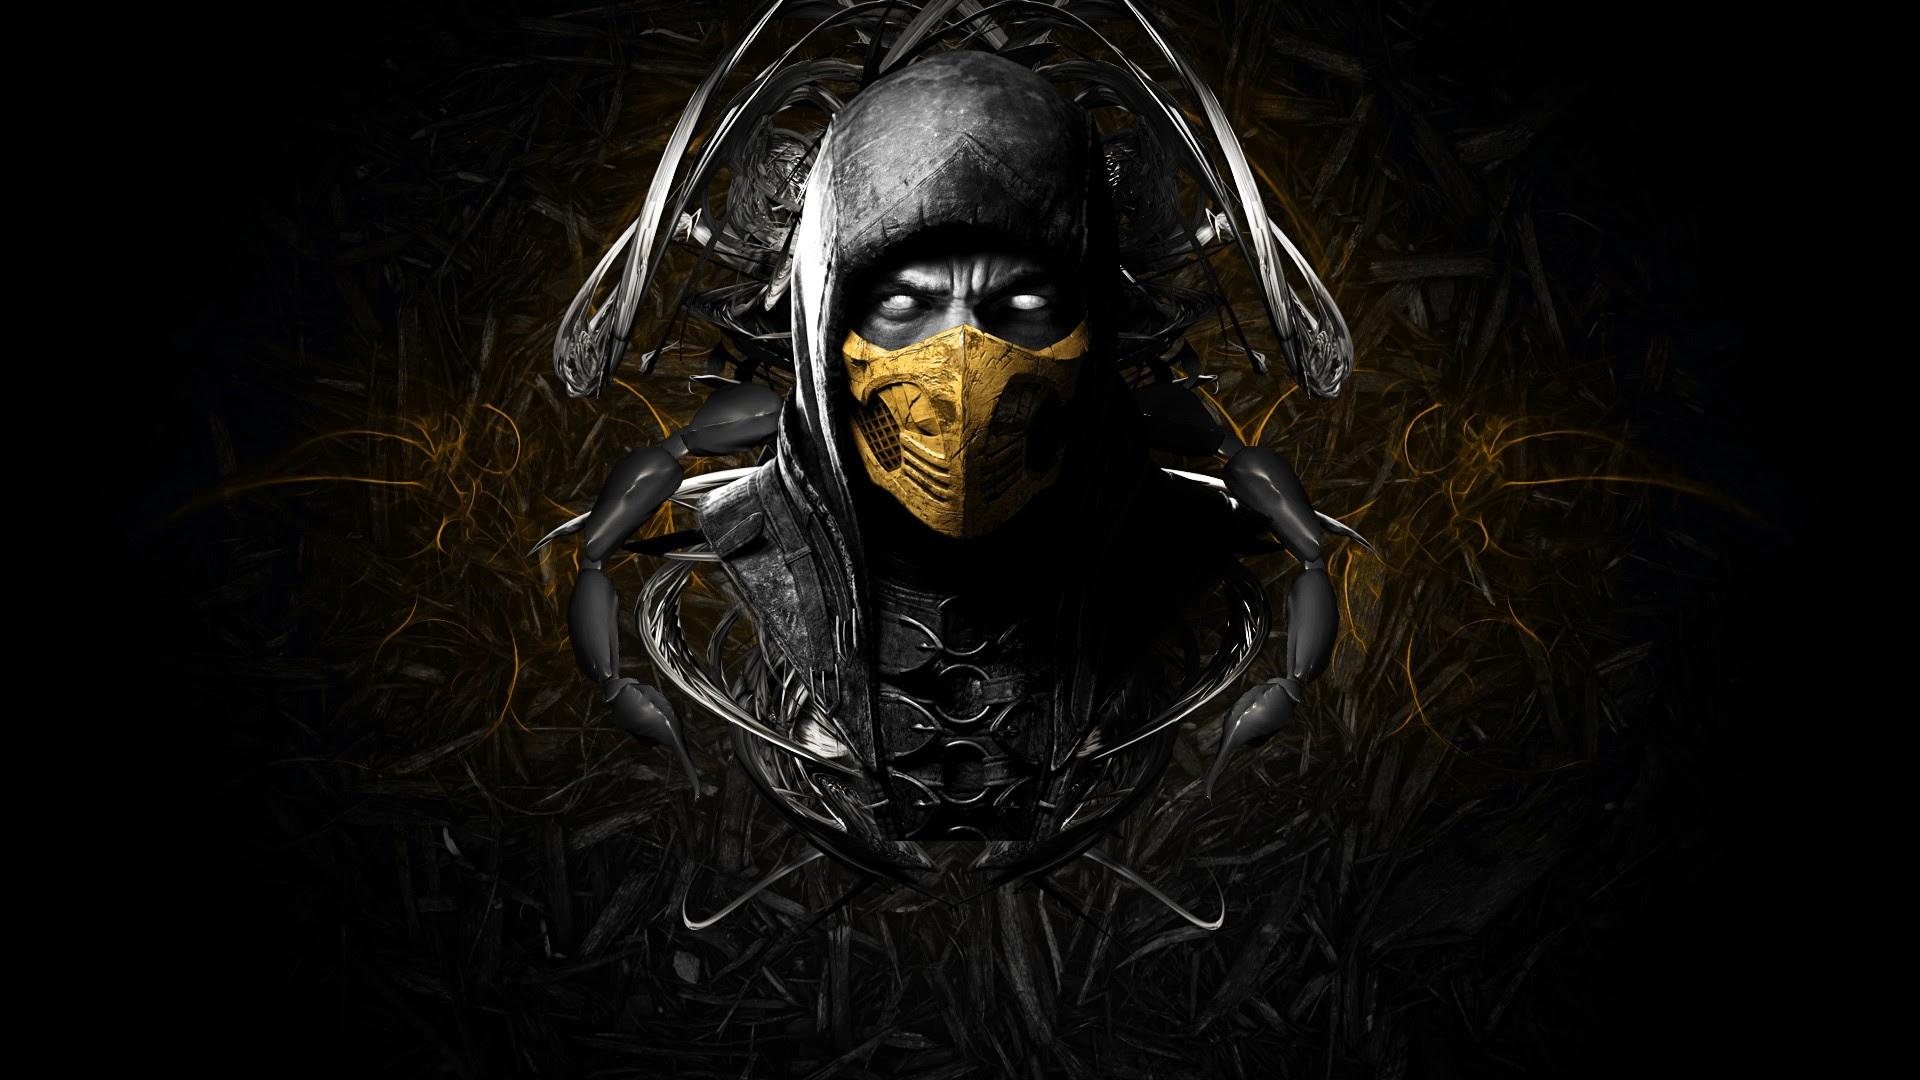 Mortal Kombat X Hd Wallpaper Iphone 7 Plus Iphone 8 Plus Hd